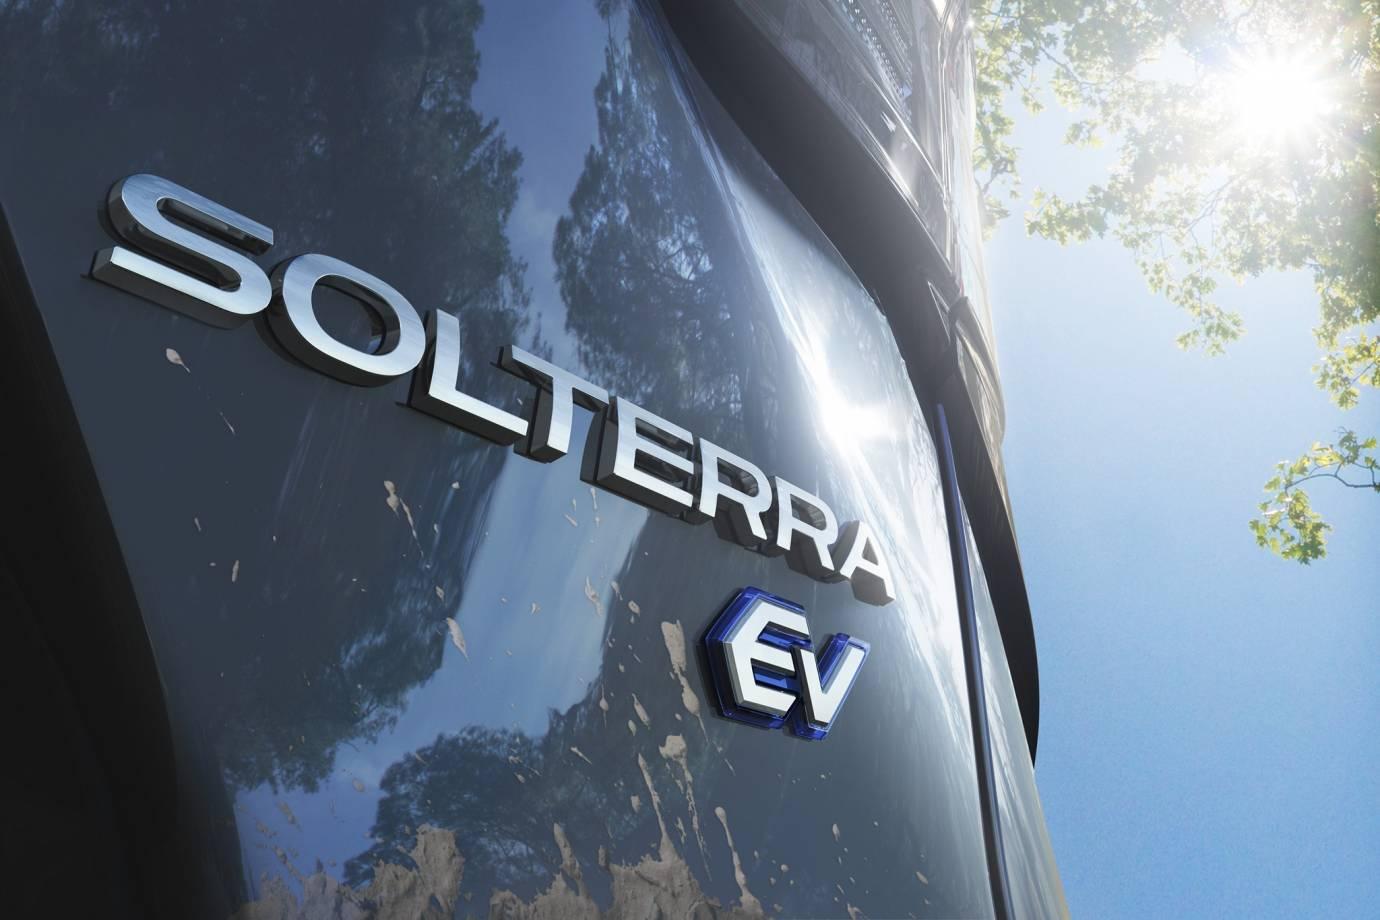 Solterra Subaru logo on close up of SUV